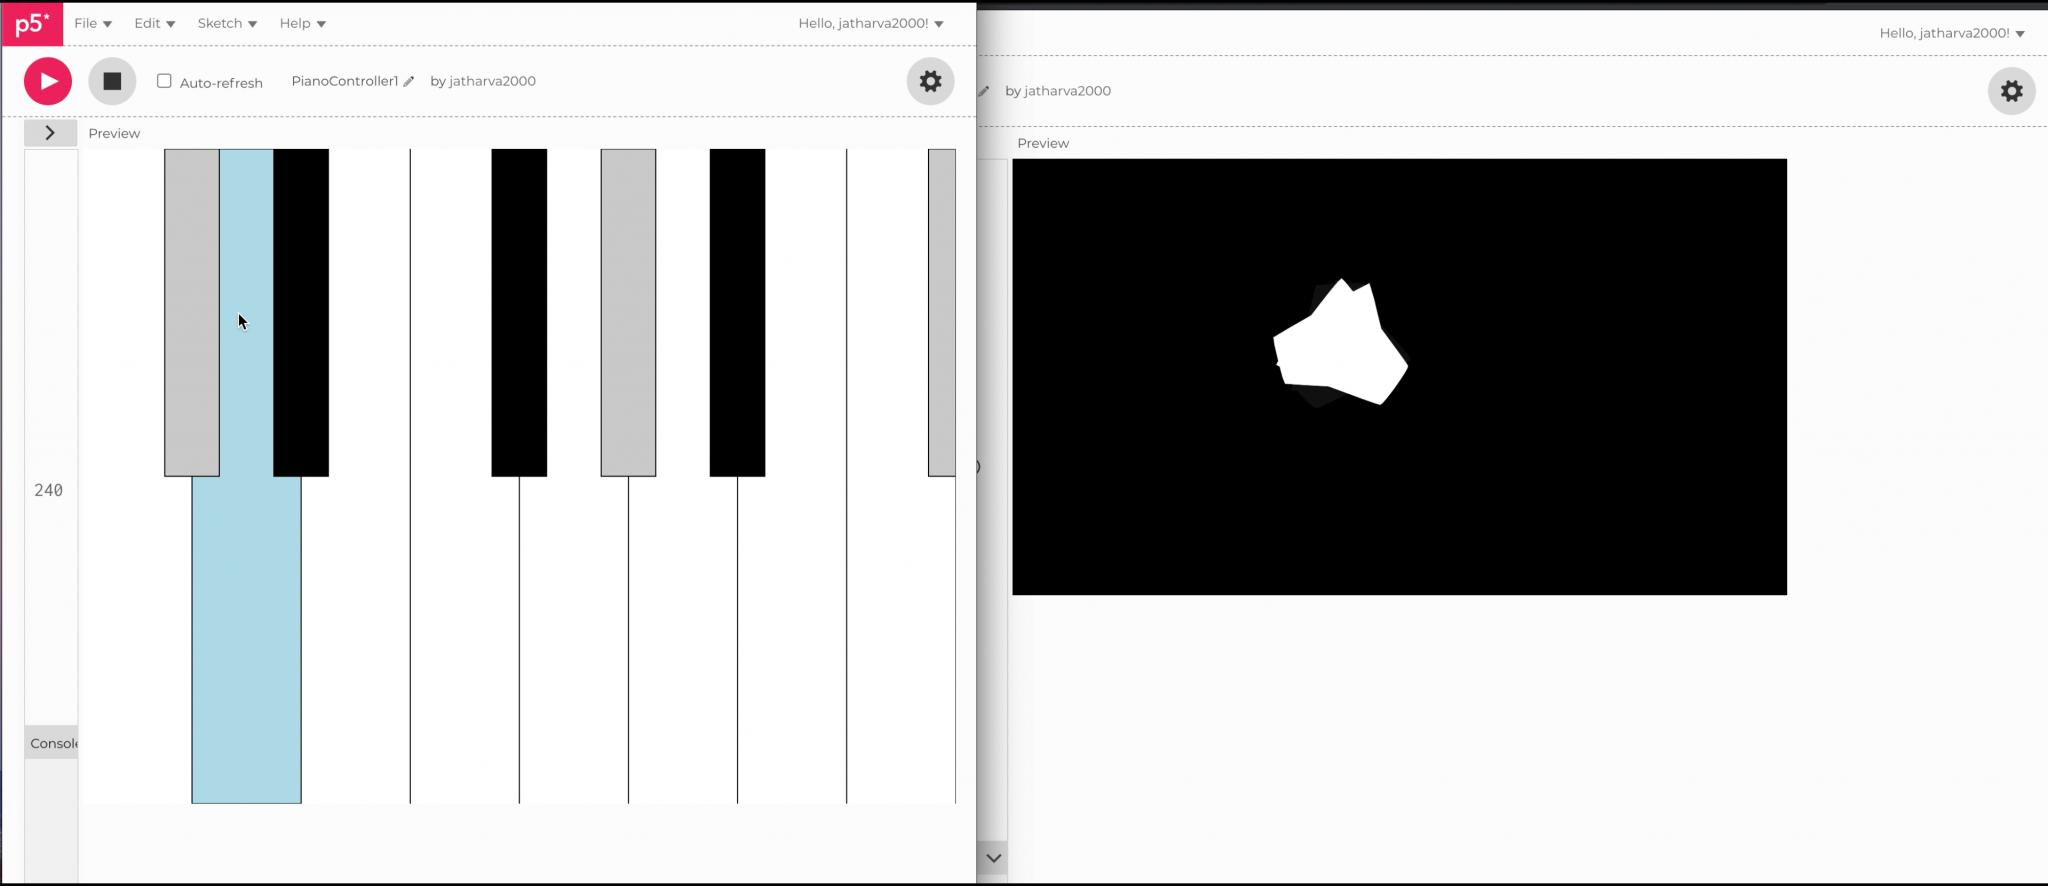 screenshot-2020-09-28-at-11-37-16-pm